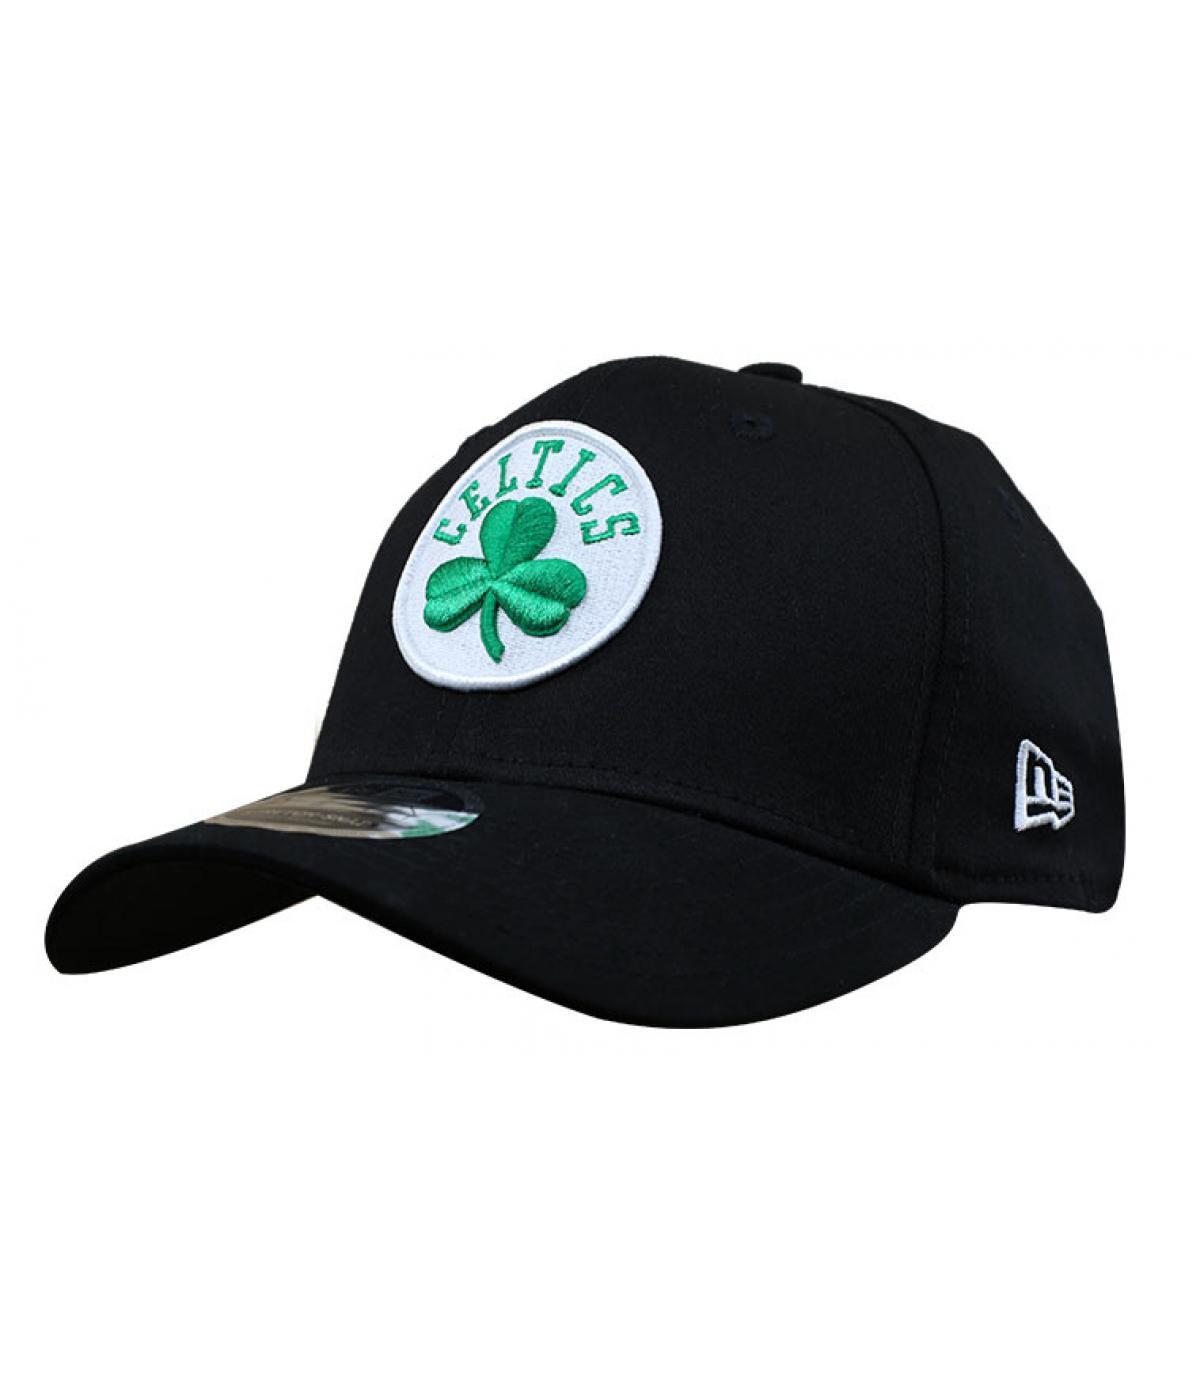 Détails Snapback Team Stretch Celtics 950 - image 2